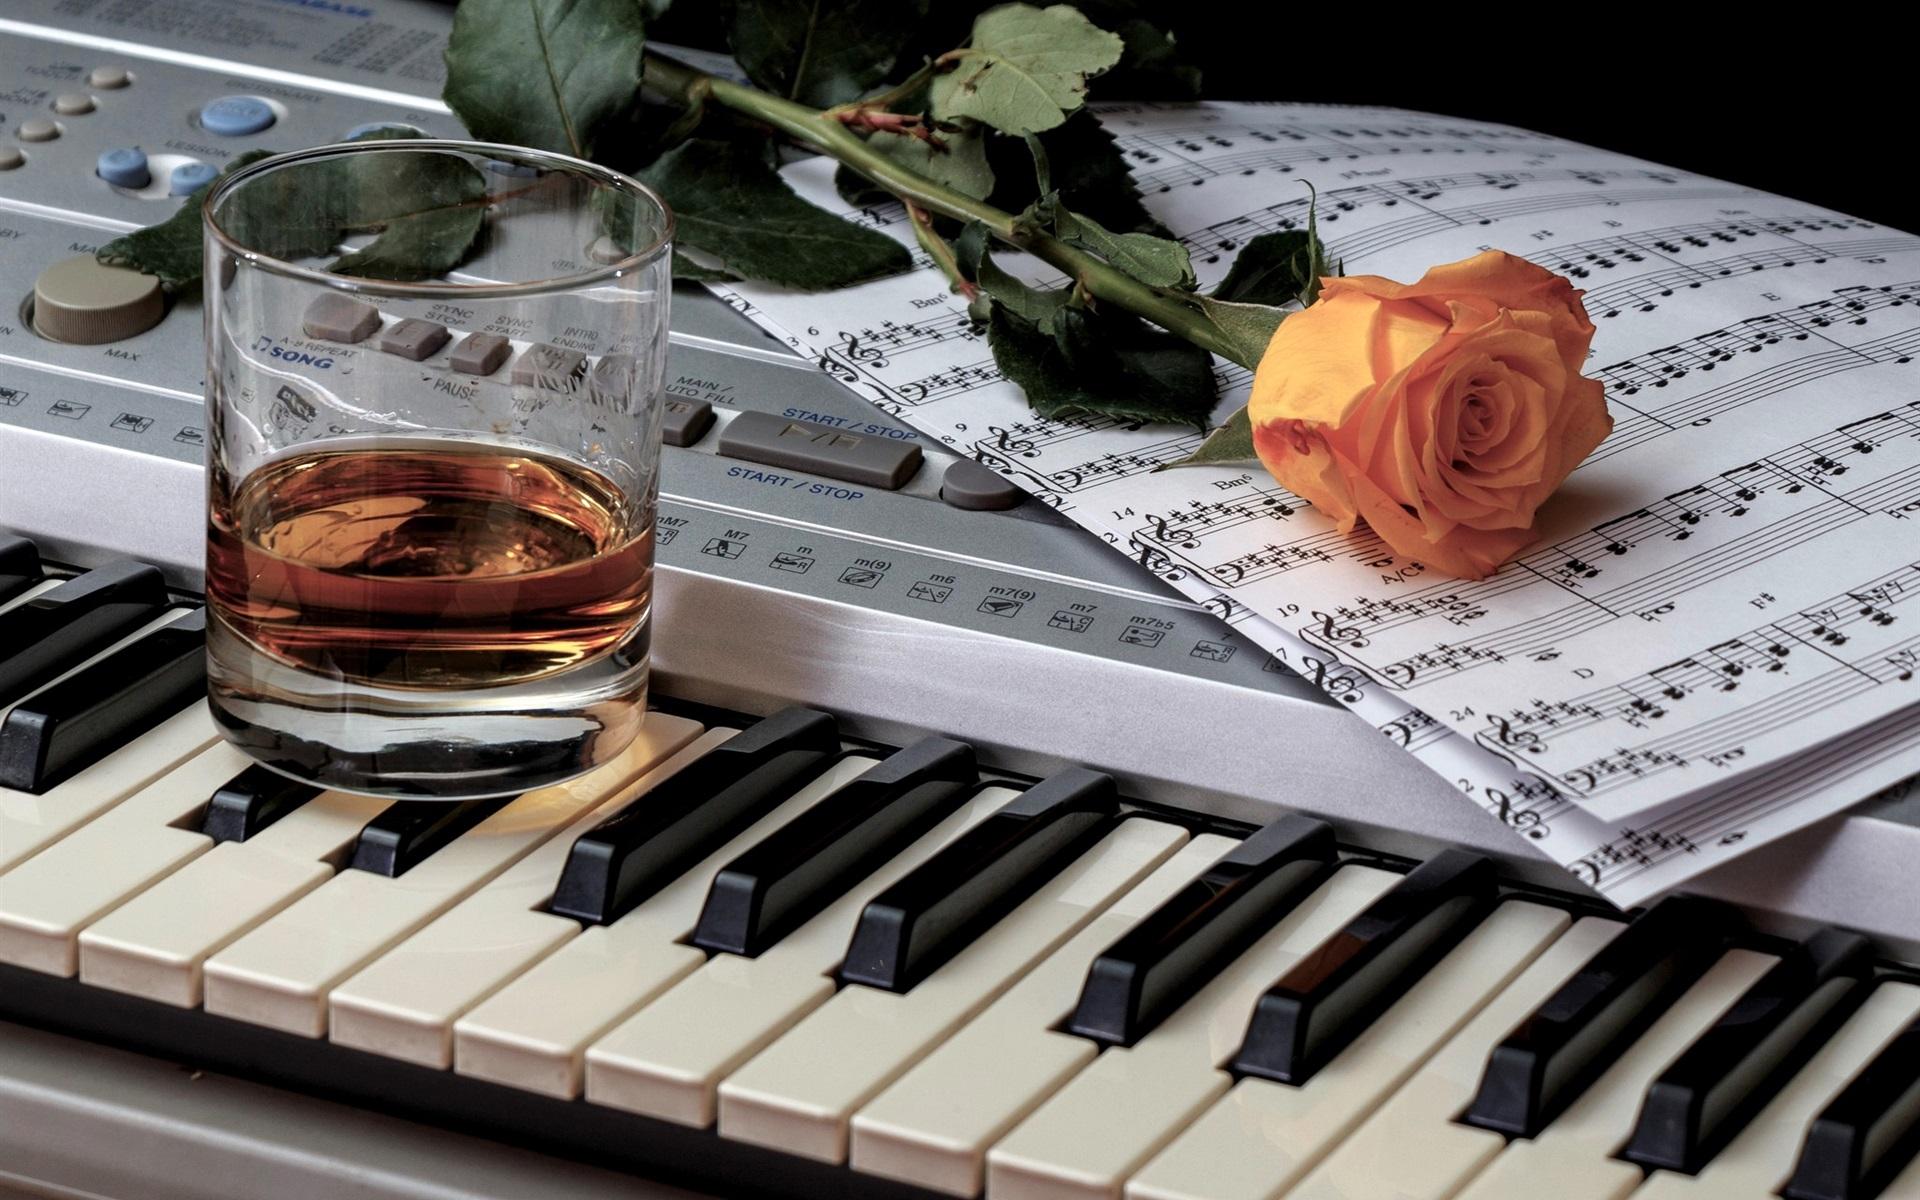 Wallpaper Wine Piano Music Score Rose 1920x1200 HD Picture Image